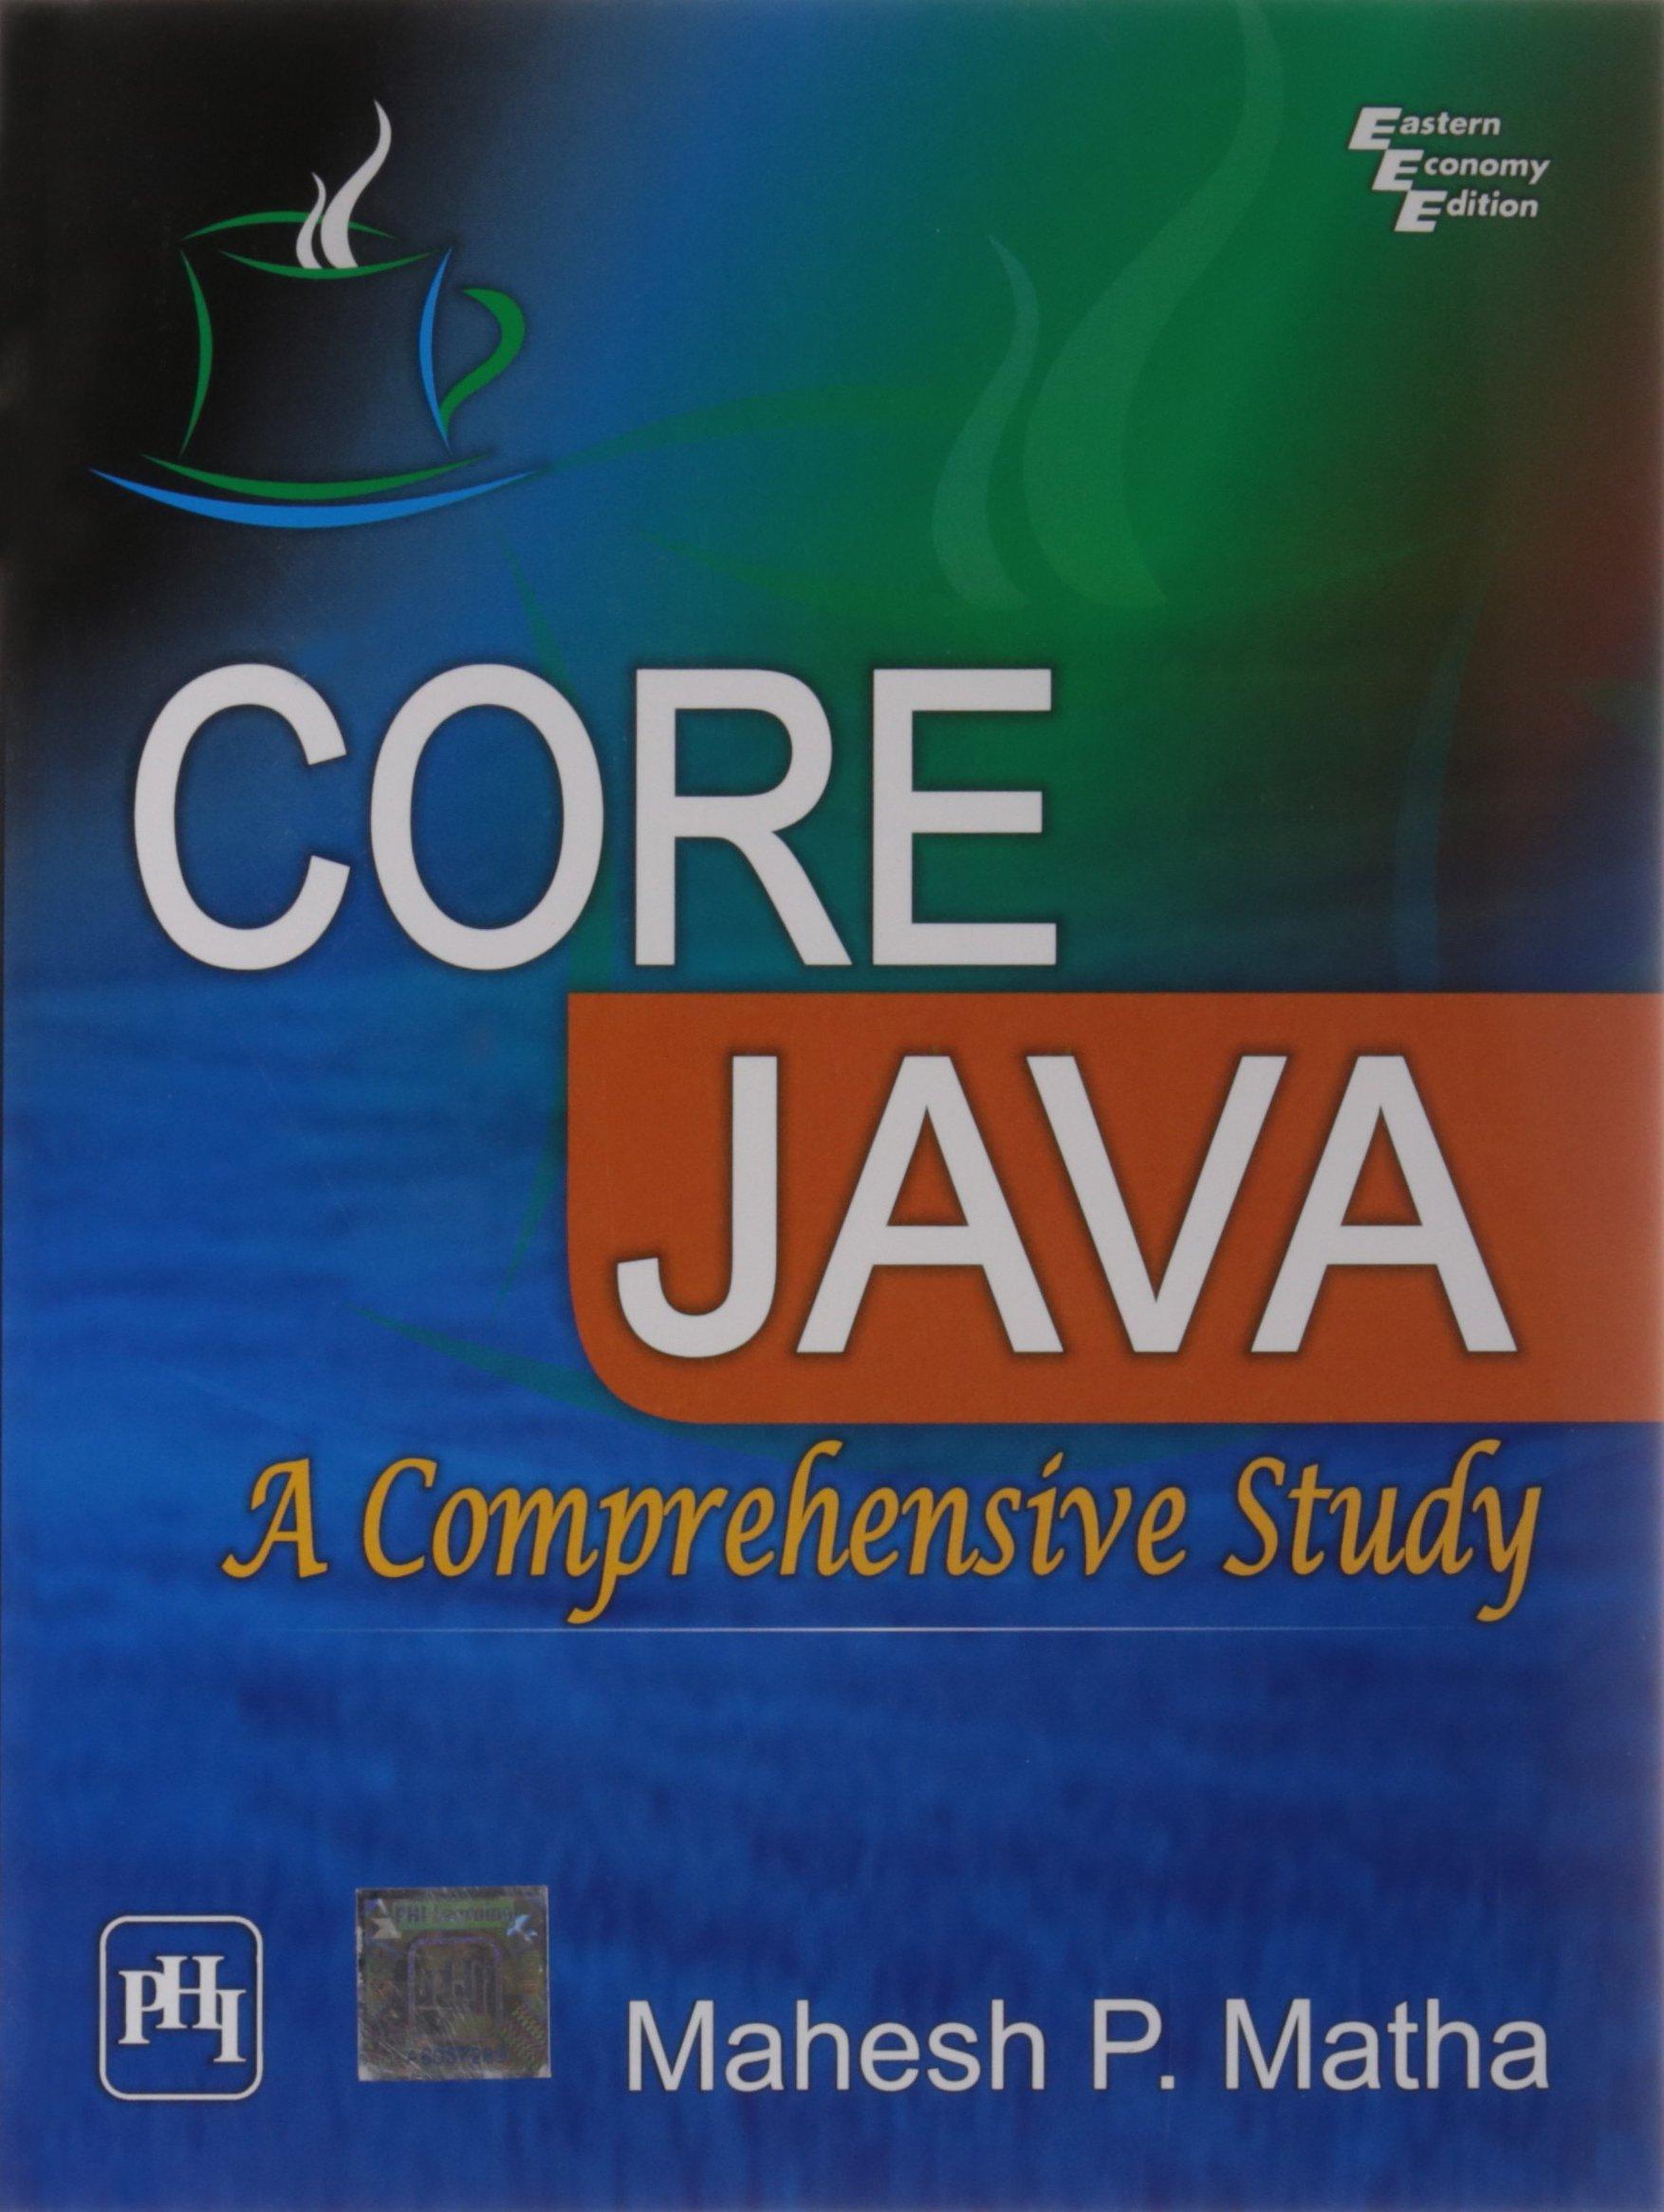 Core Java: A Comprehensive Study